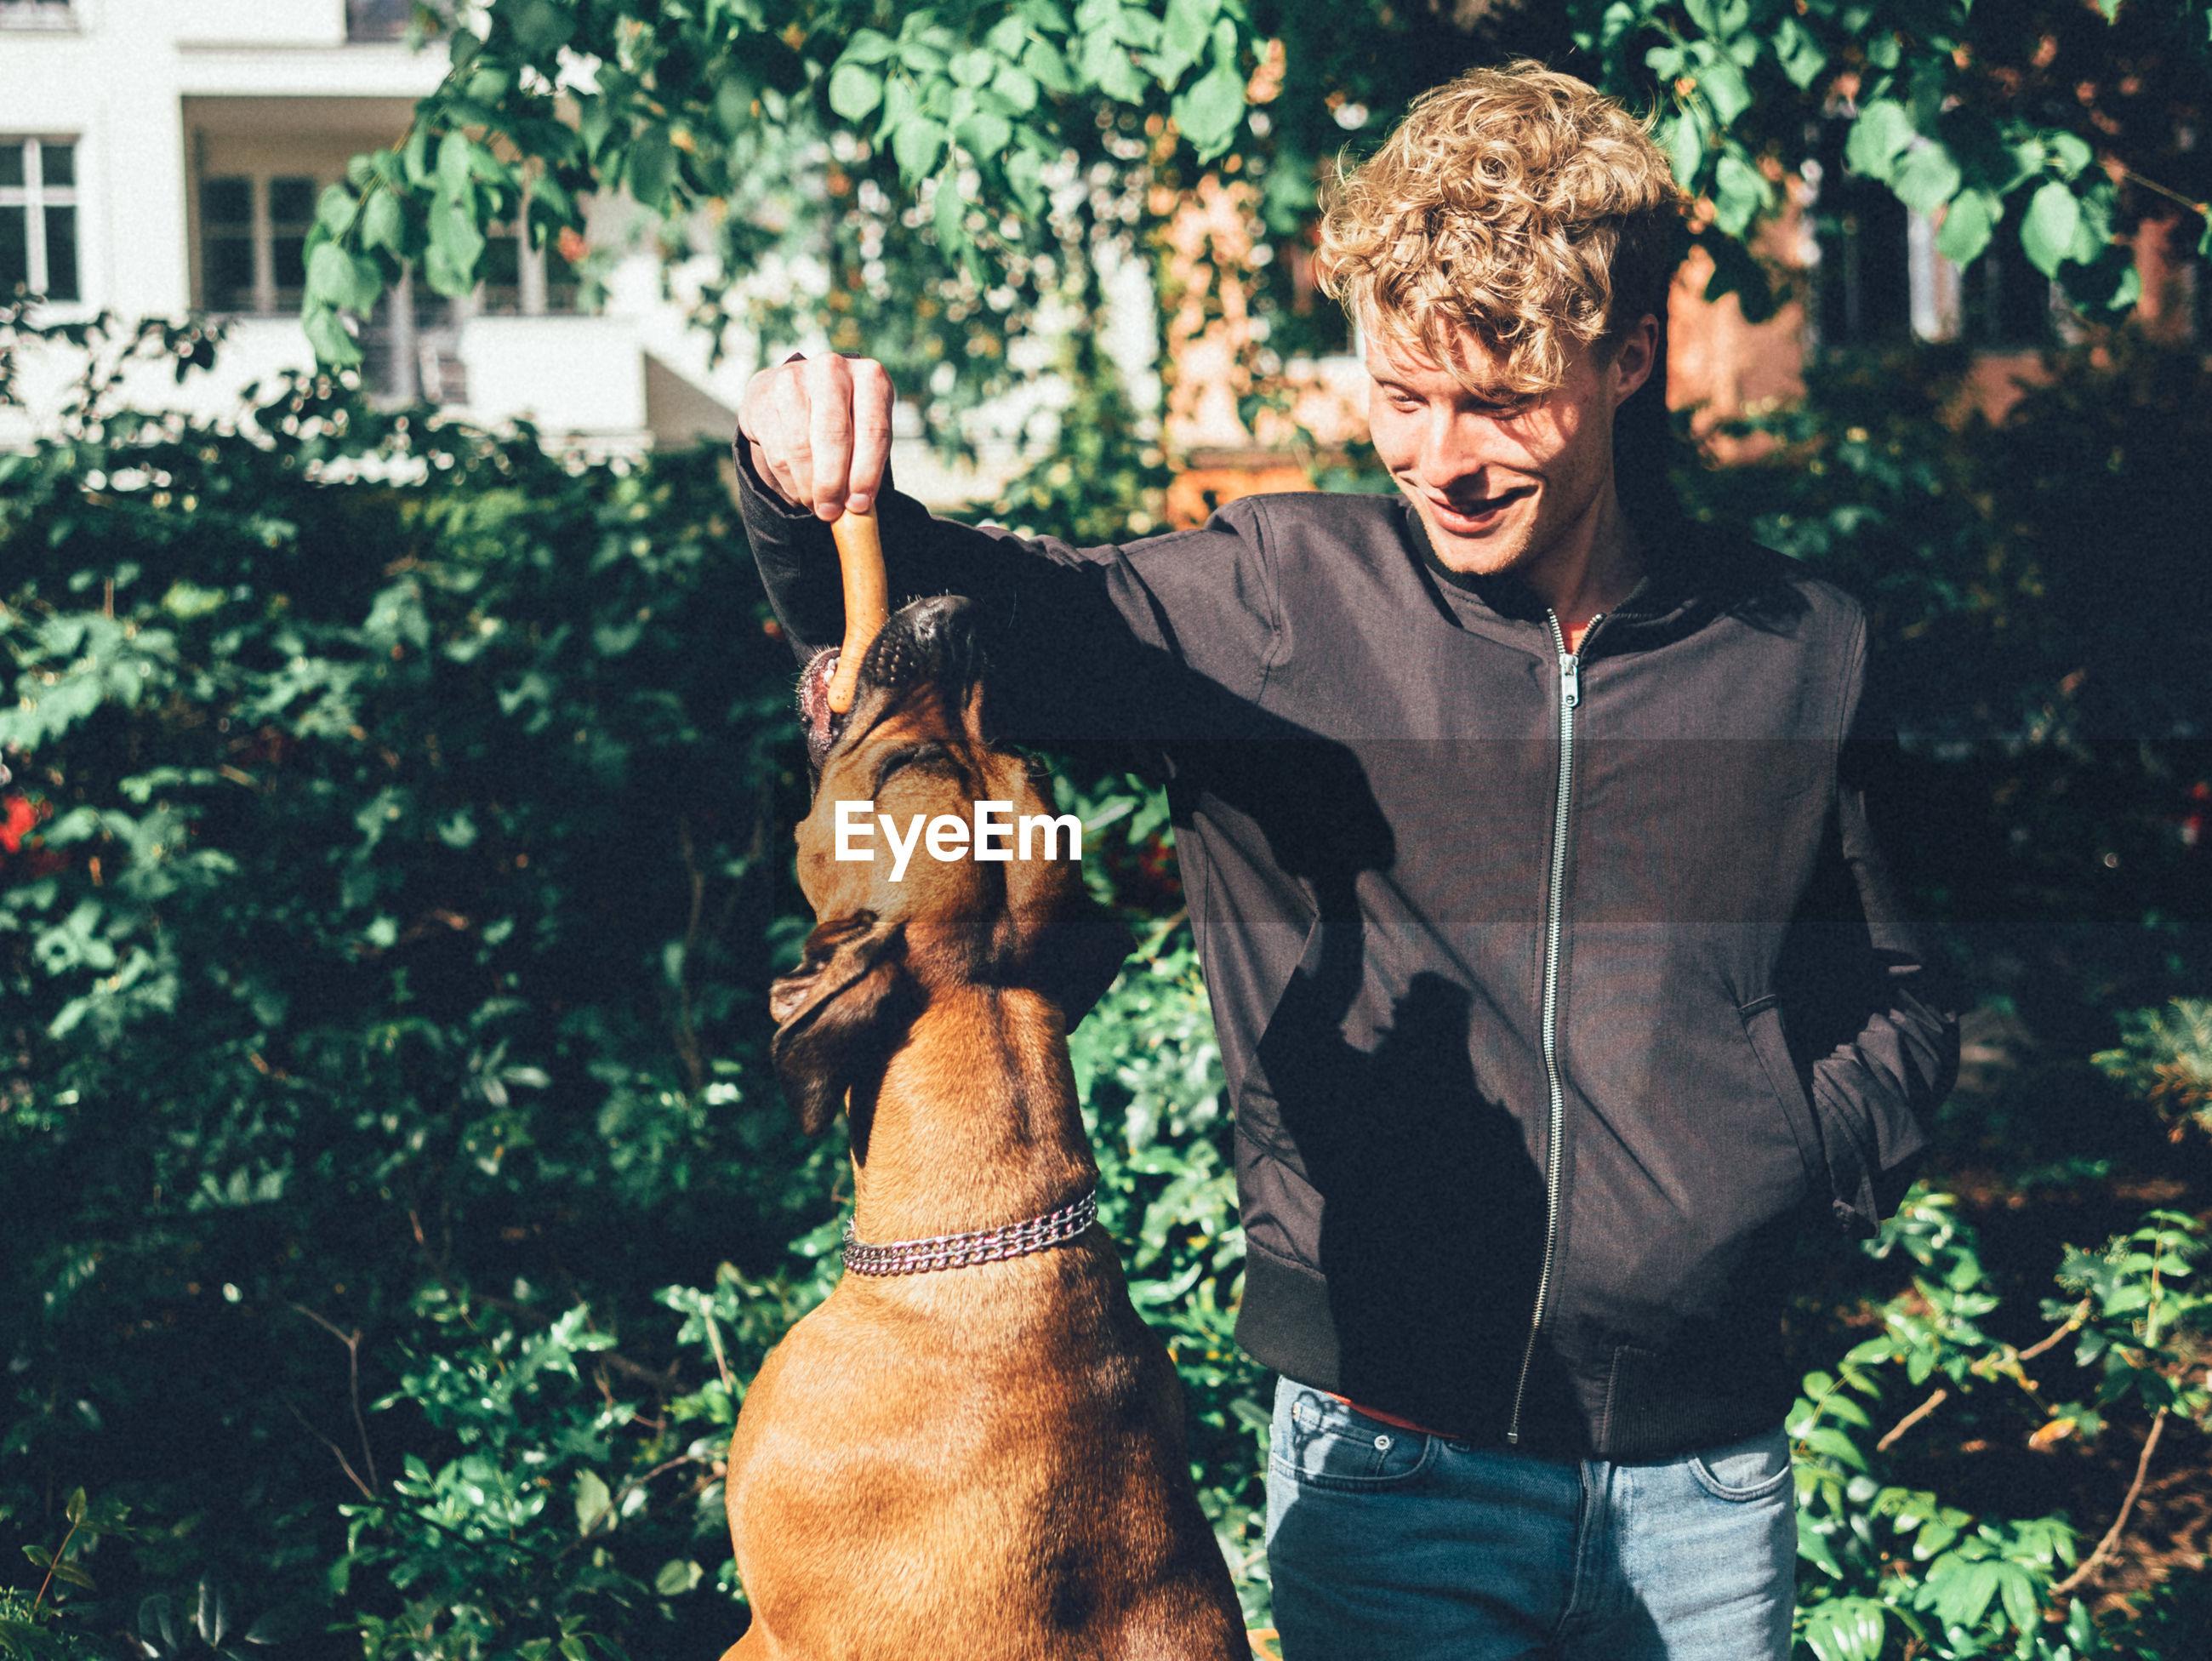 Smiling young man feeding sausage to dog in yard